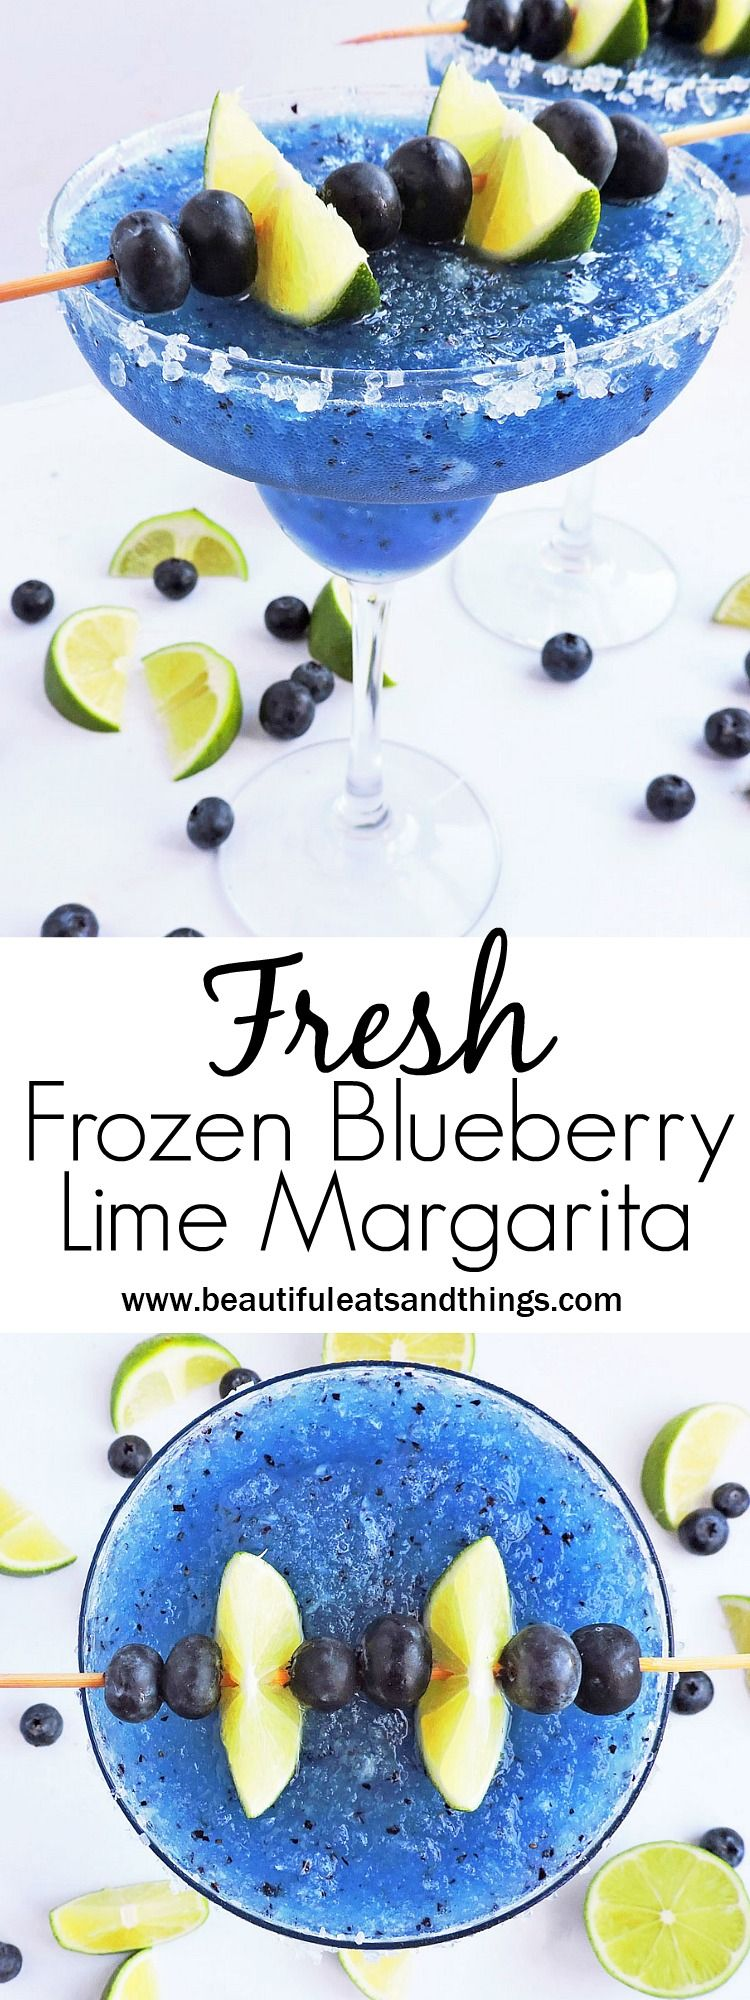 Fresh Frozen Blueberry Lime Margarita - Beautiful Eats & Things